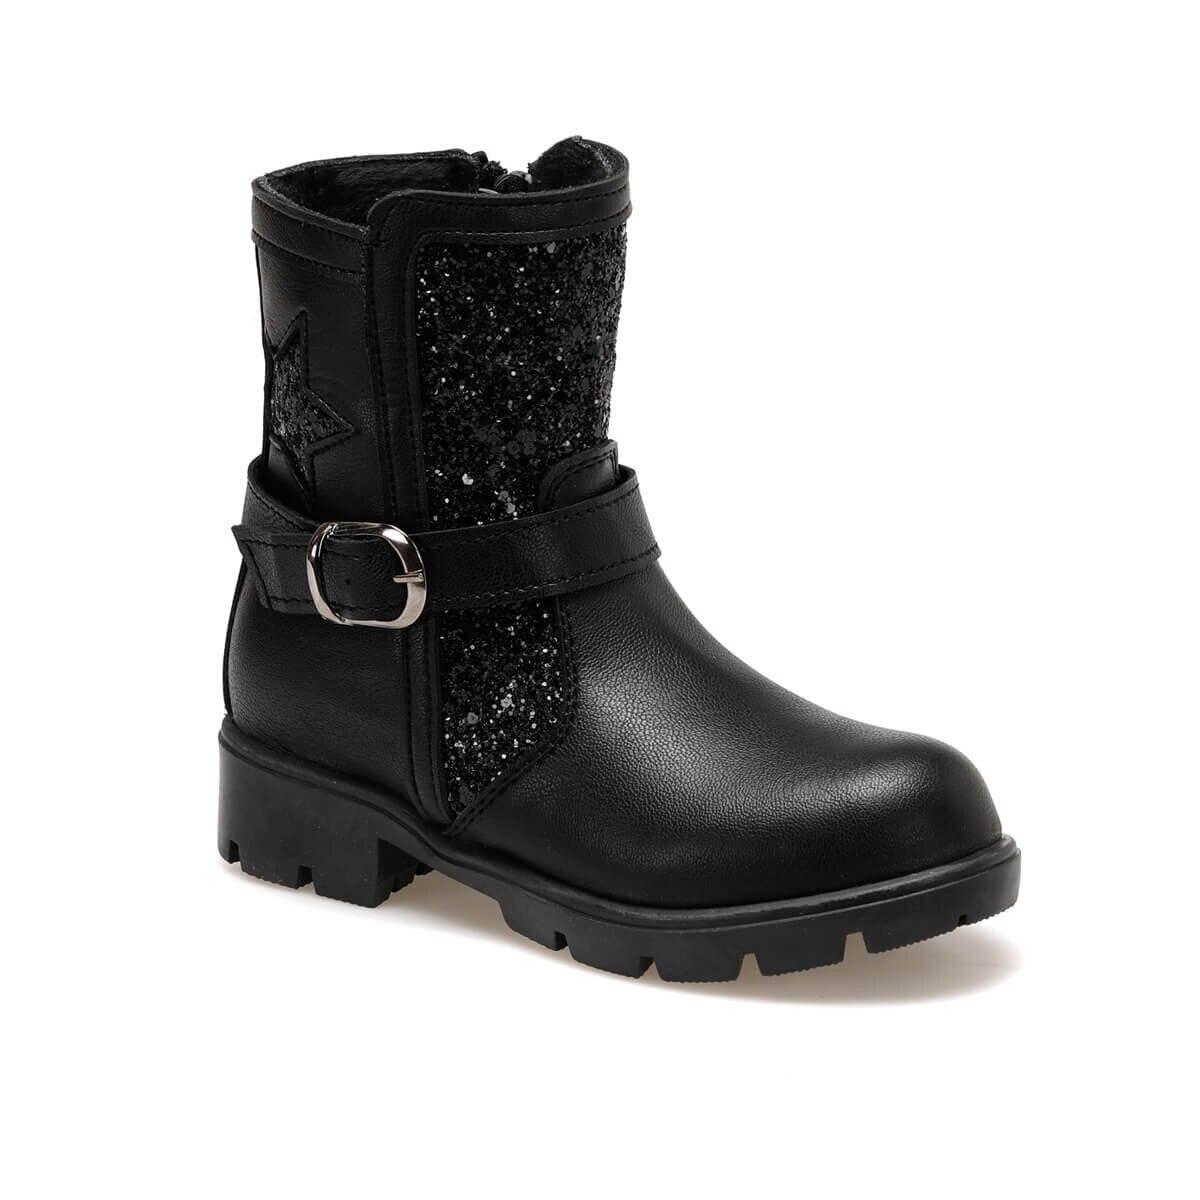 FLO 92. ETINI-1.P Black Female Child Boots PINKSTEP